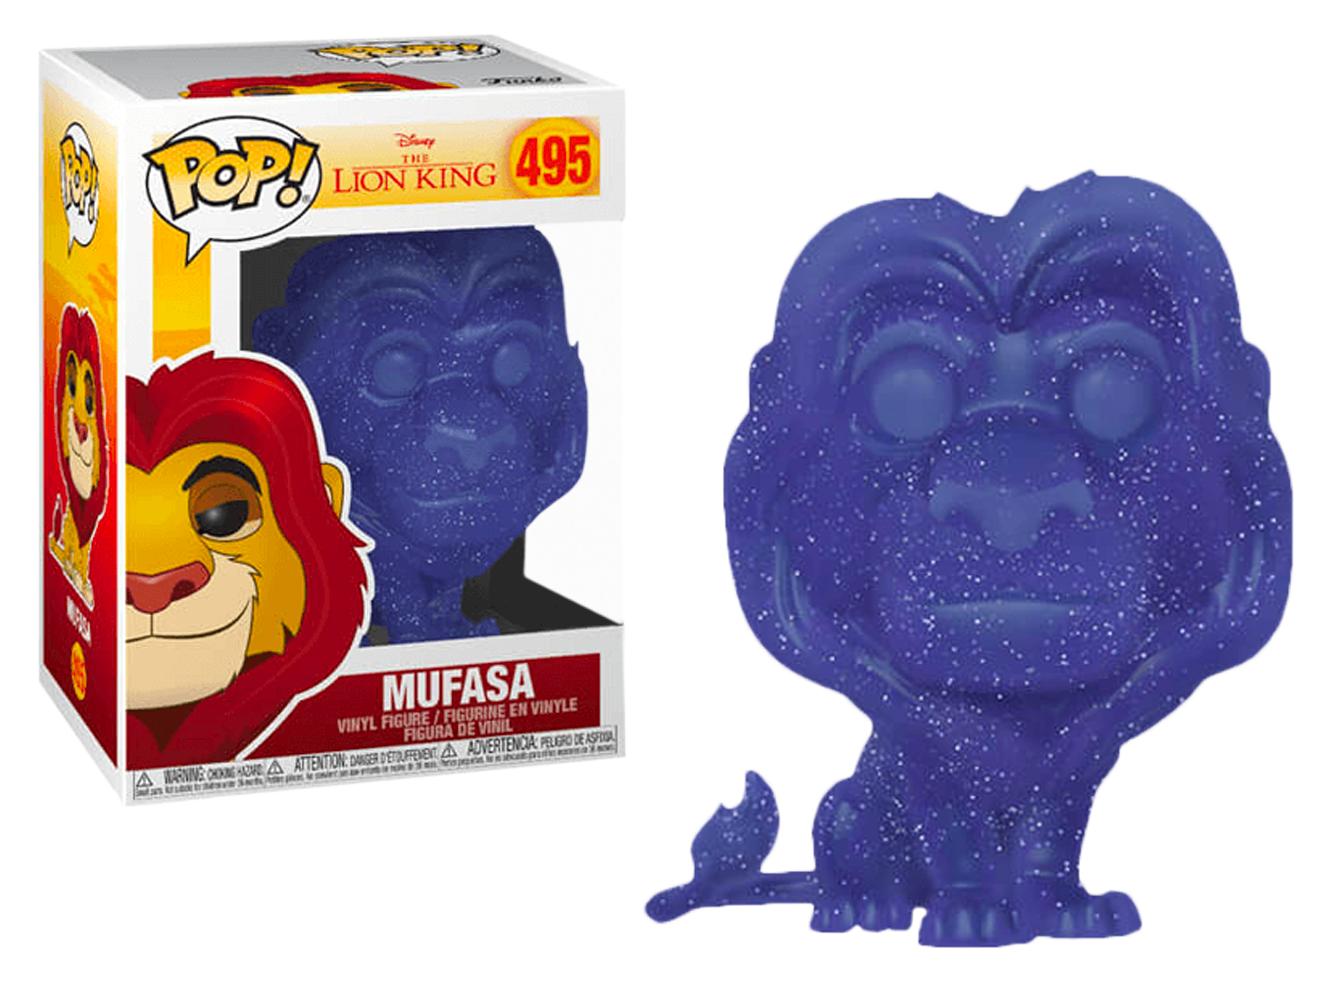 Disney The Lion King MUFASA #495 Pop Vinyl Figure NEW /& IN STOCK NOW Funko Pop